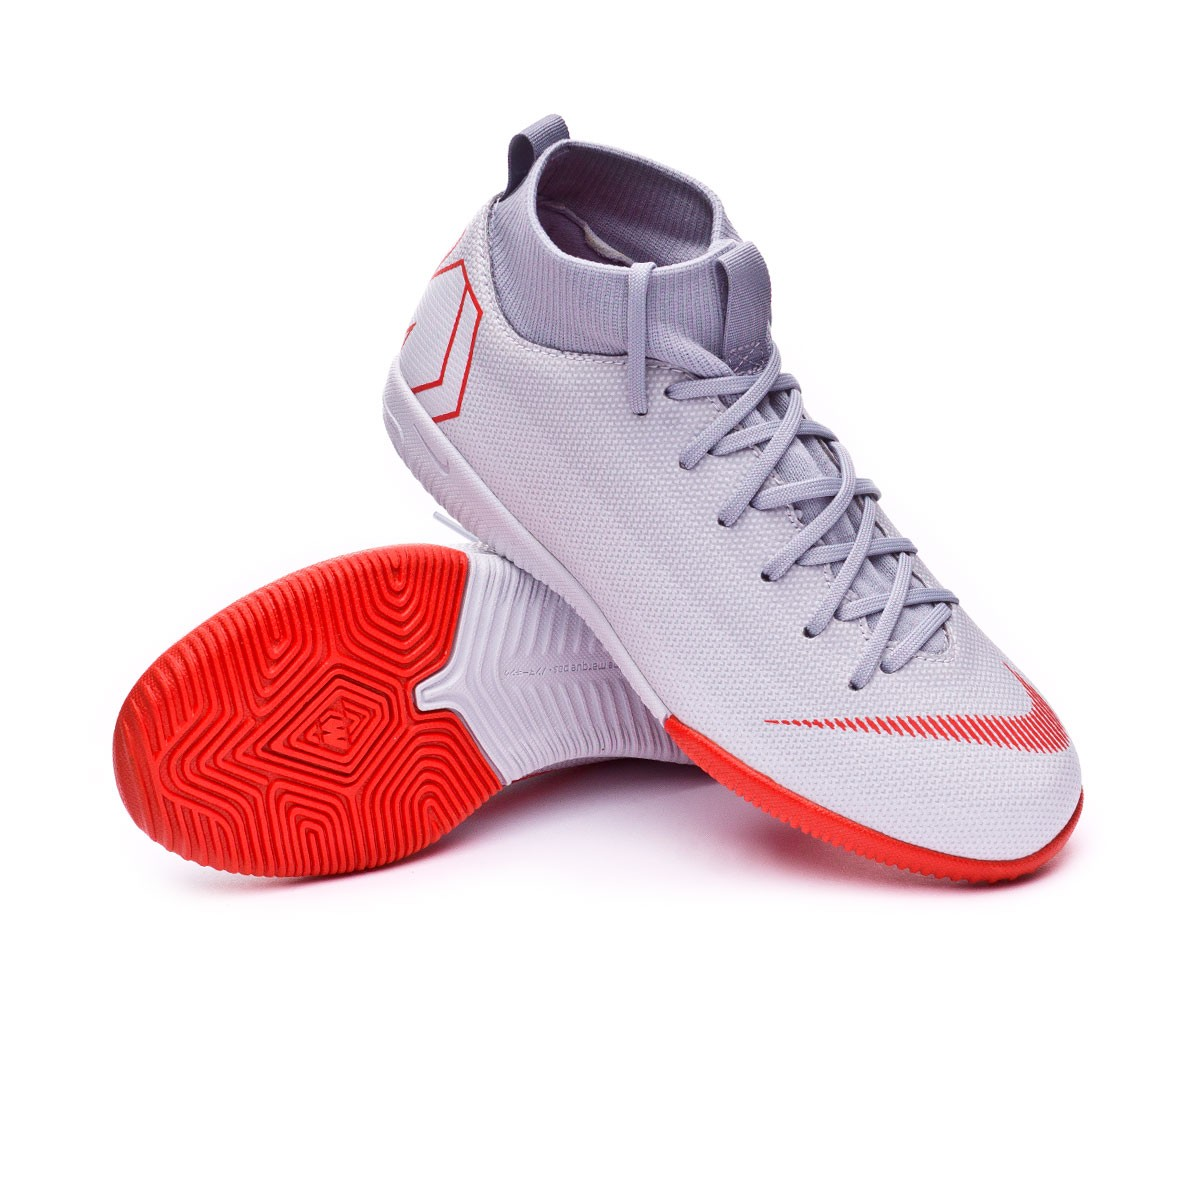 fc9f4e2fe Futsal Boot Nike Kids Mercurial SuperflyX VI Academy GS IC Wolf grey-Light  crimson-Pure platinum - Football store Fútbol Emotion